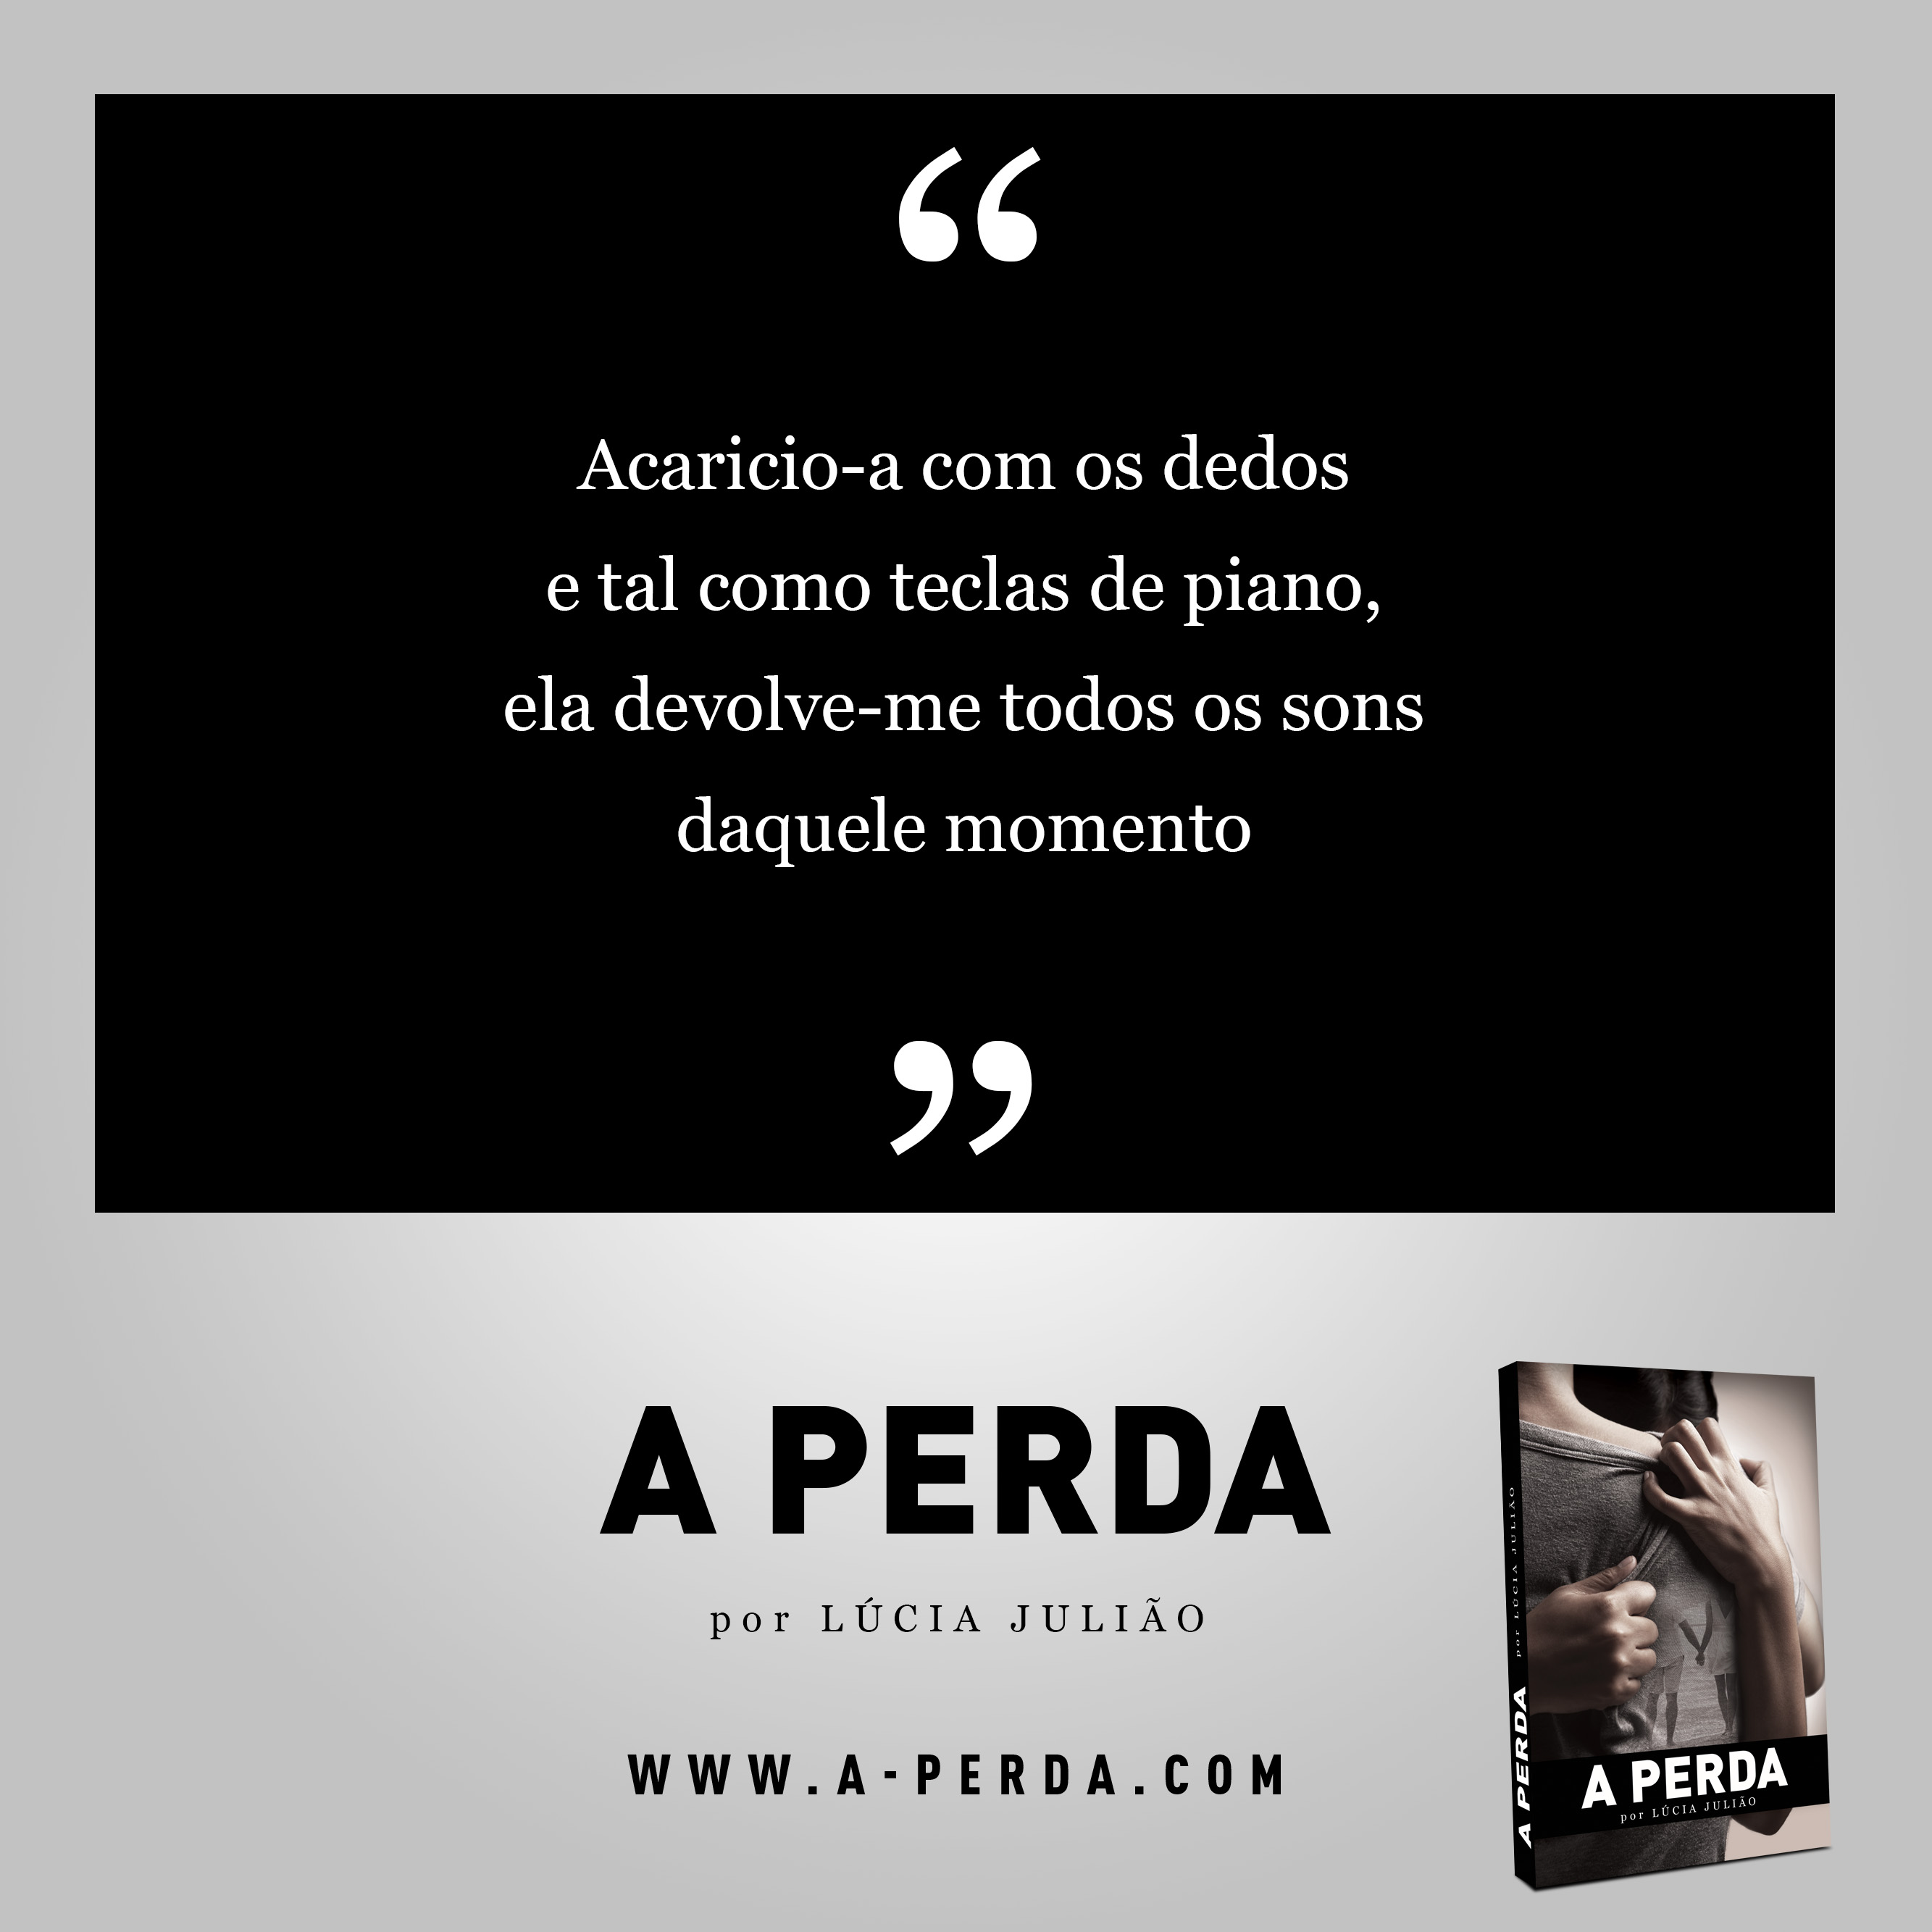 016-capitulo-23-livro-a-Perda-de-Lucia-Juliao-Instagram